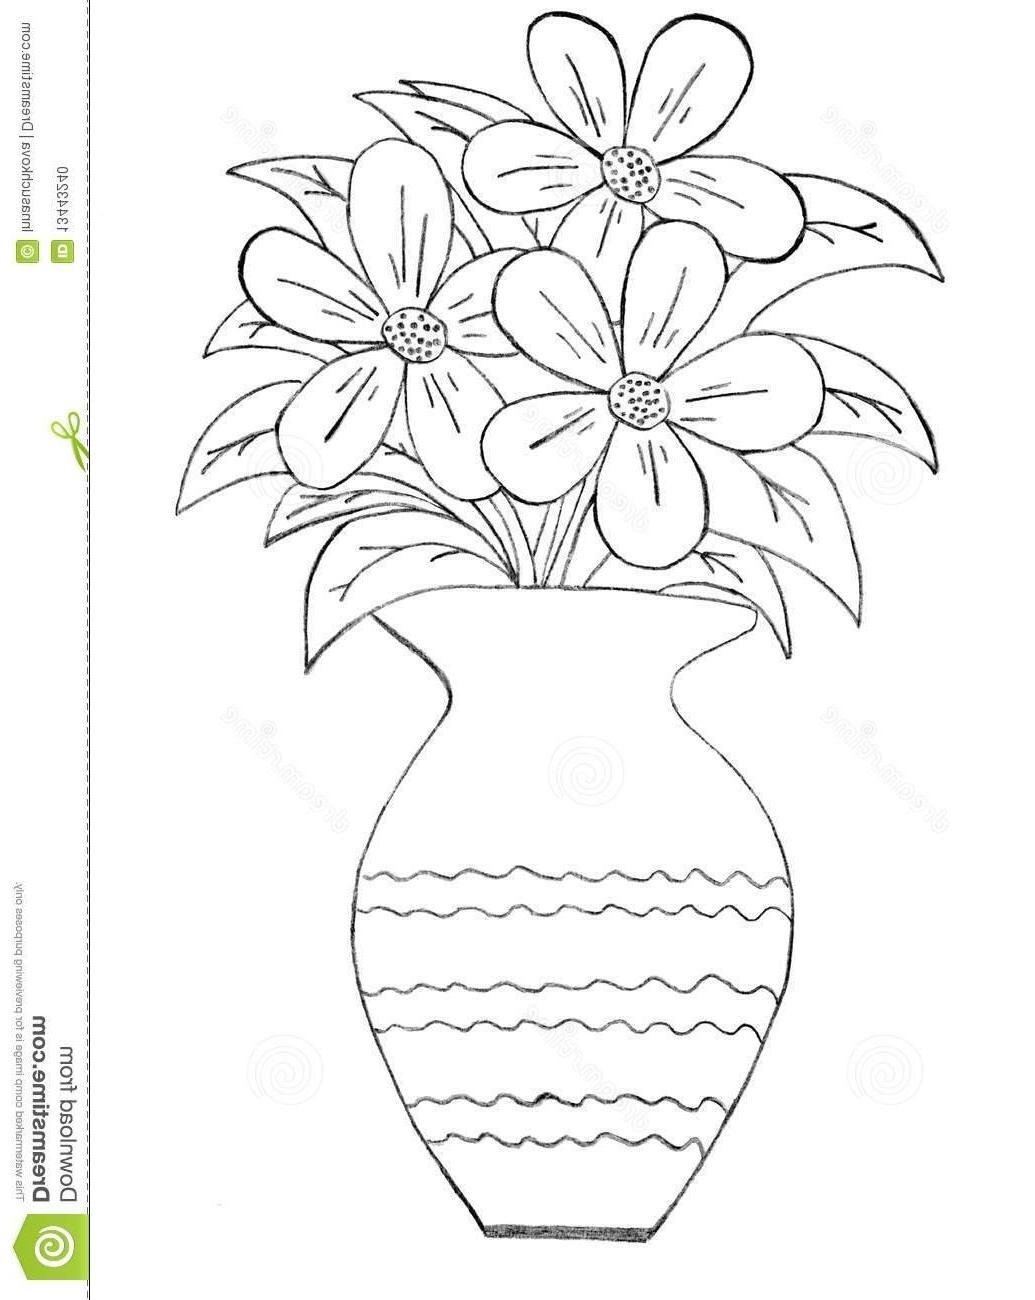 1035x1300 Drawn Vase Pencil Drawing